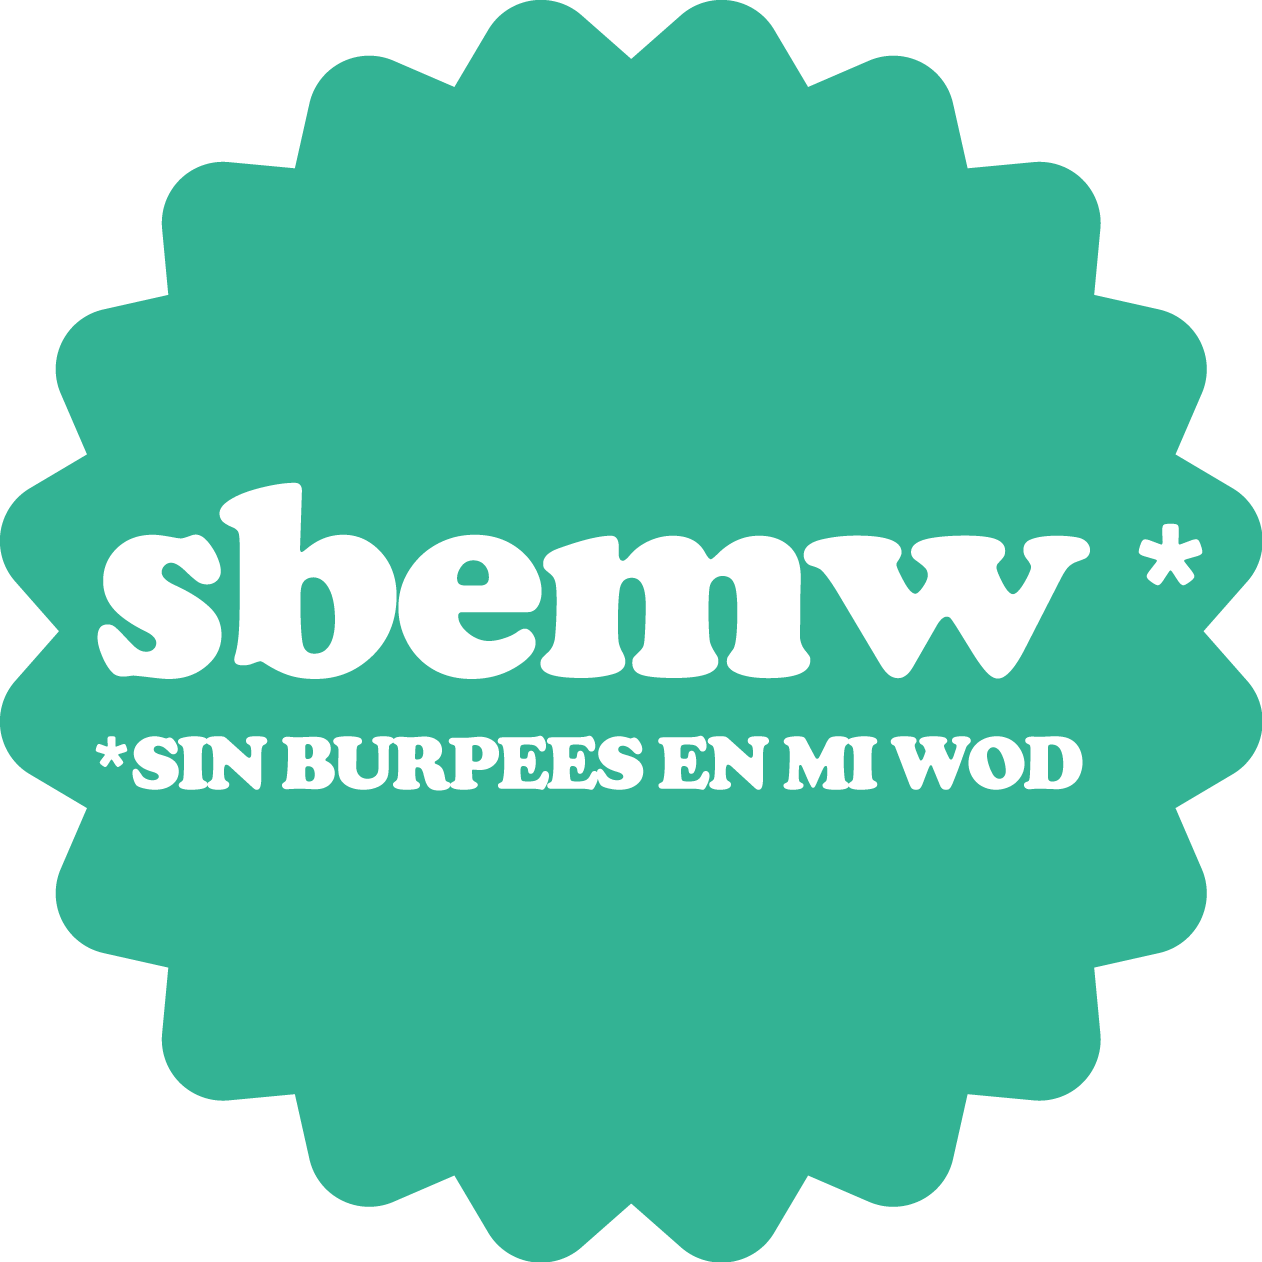 SBEMW - SinBurpeesEnMiWod